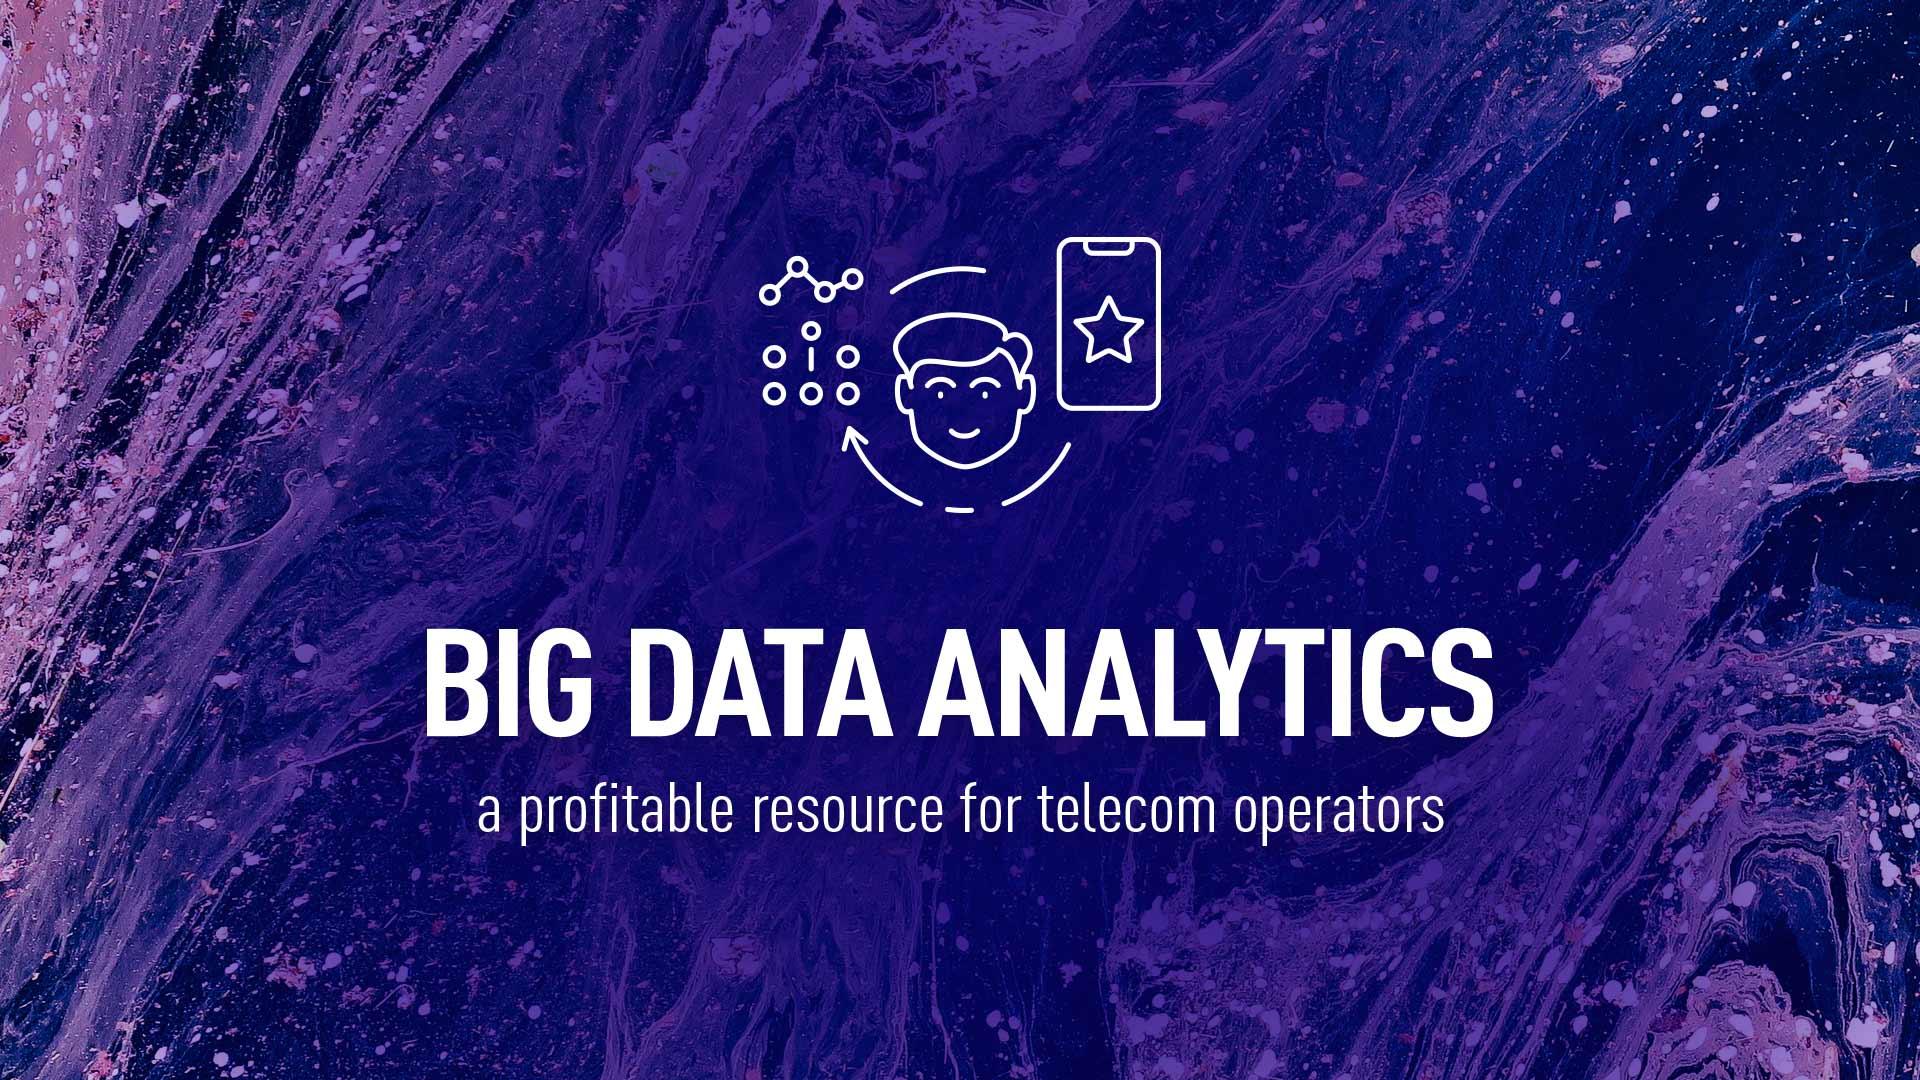 Big Data Analytics solutions - a profitable resource for telecom operators